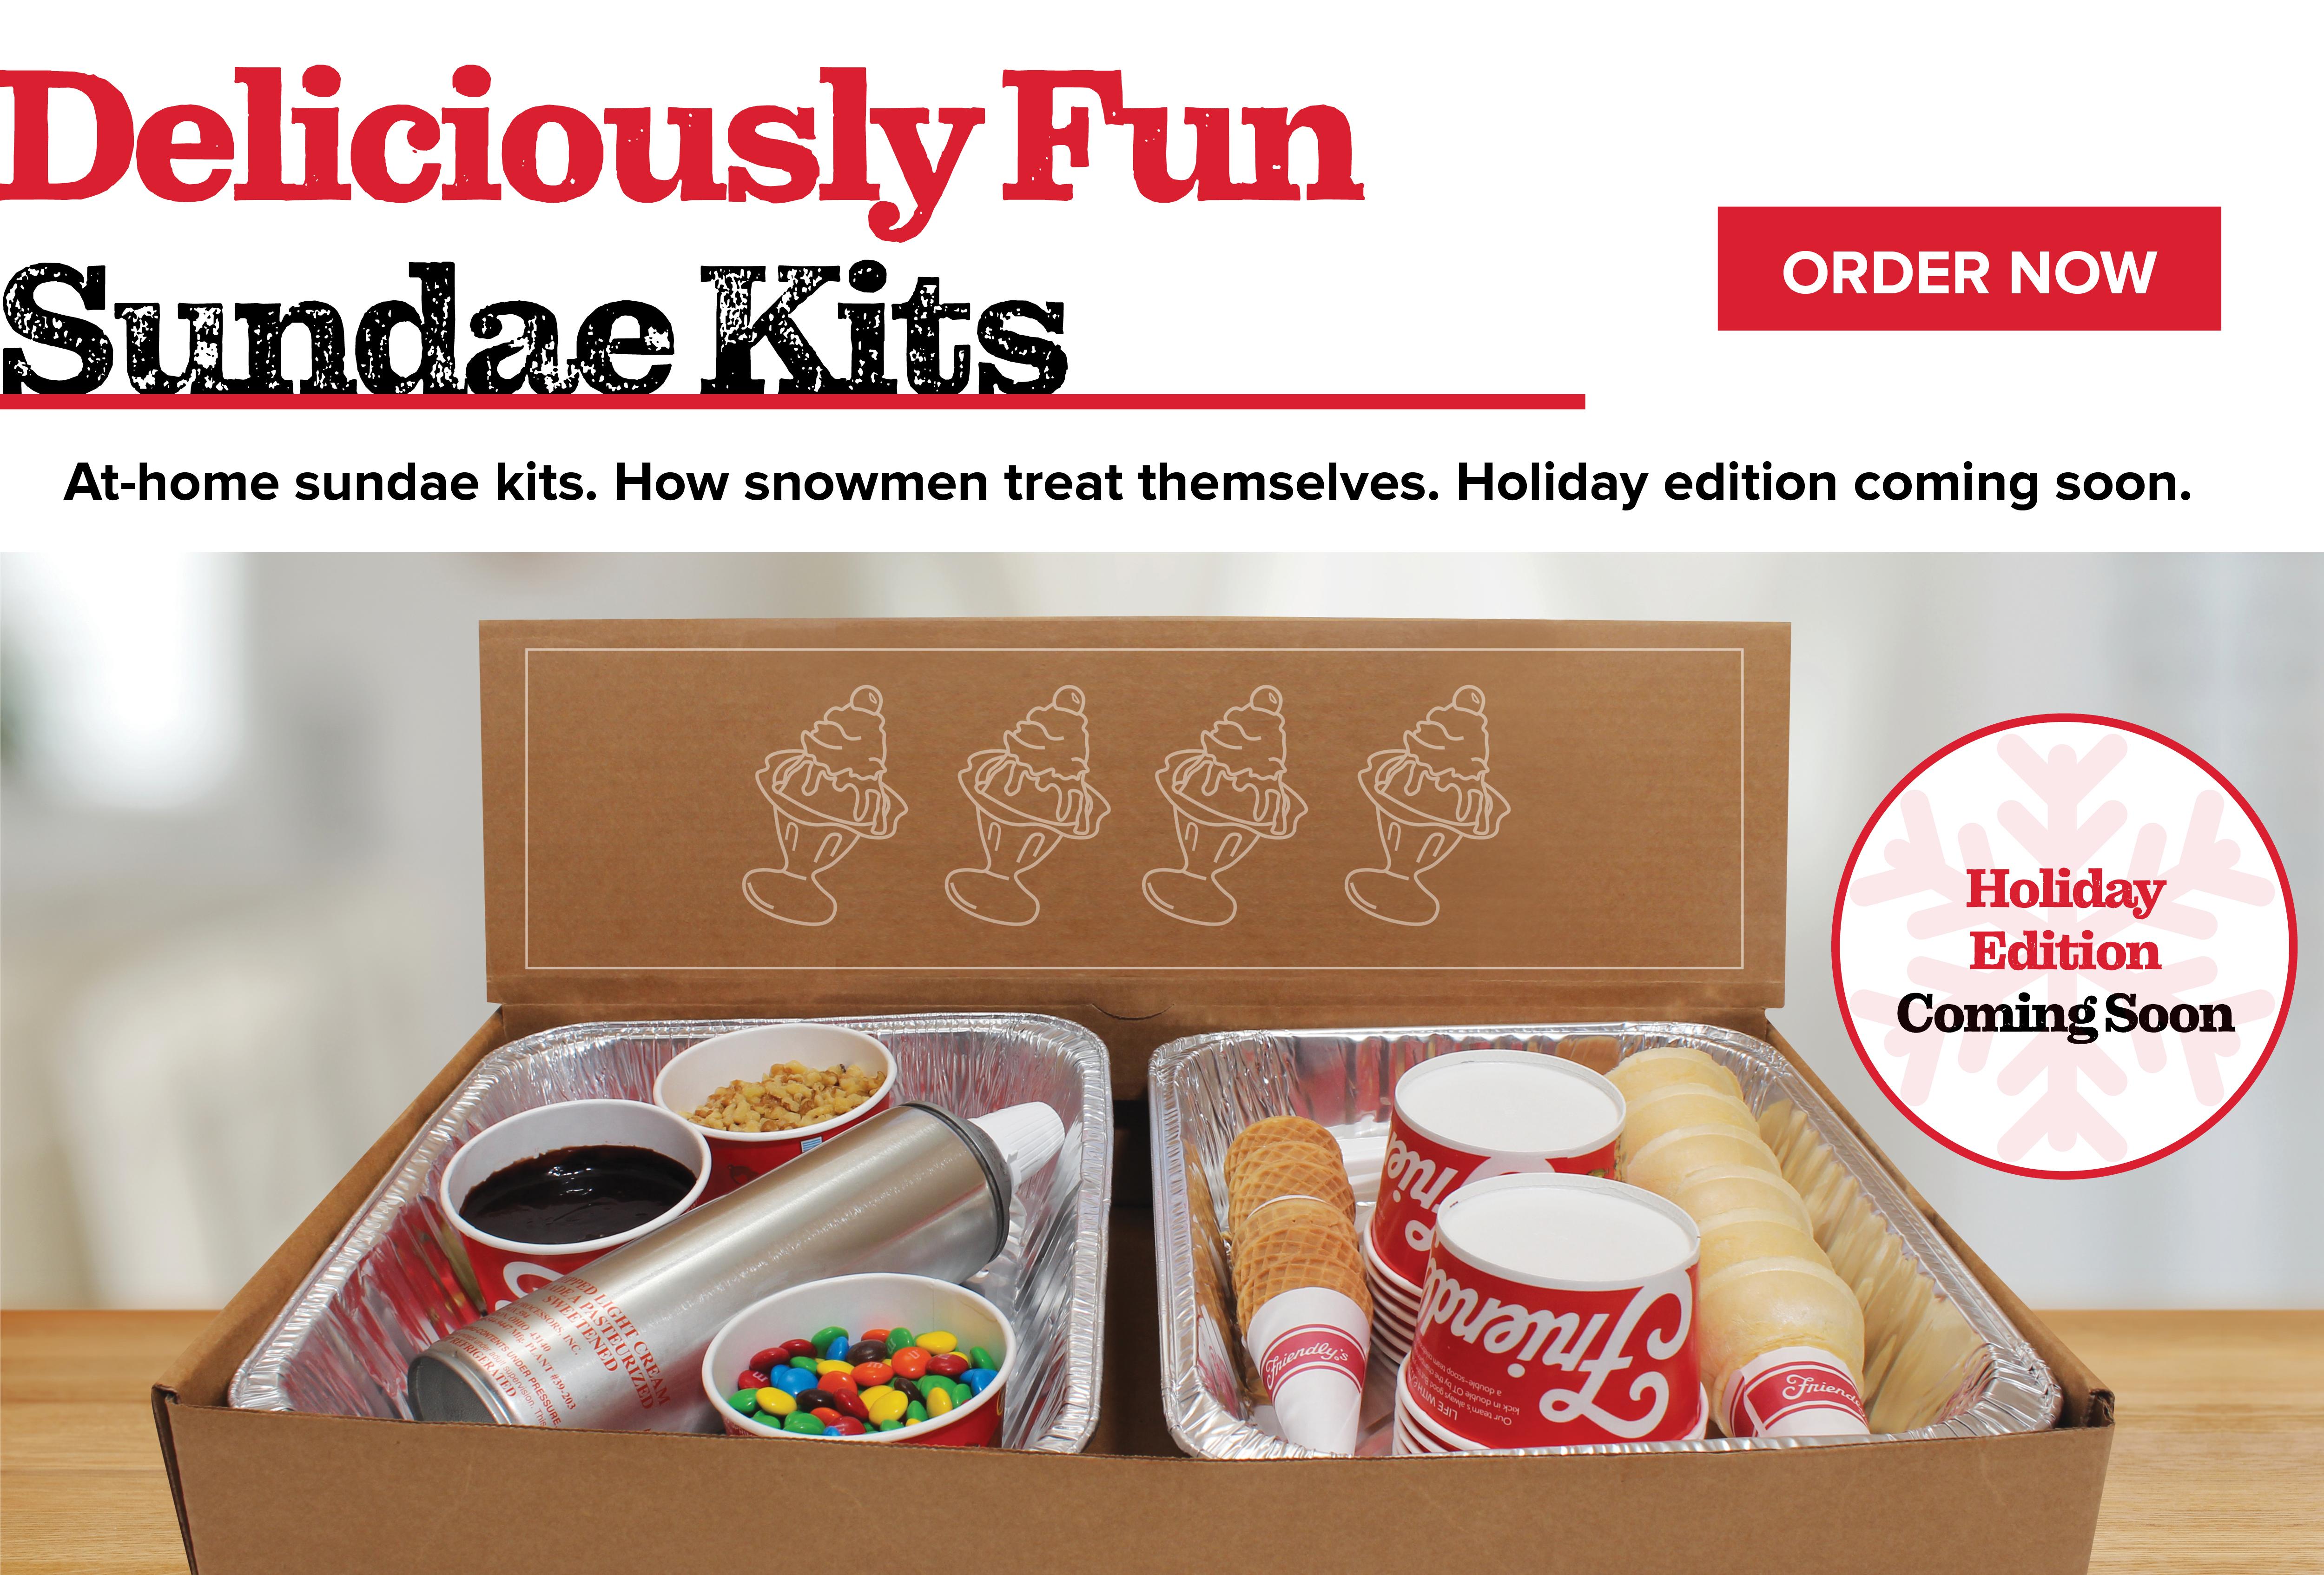 Deliciously Fun Sundae Kits